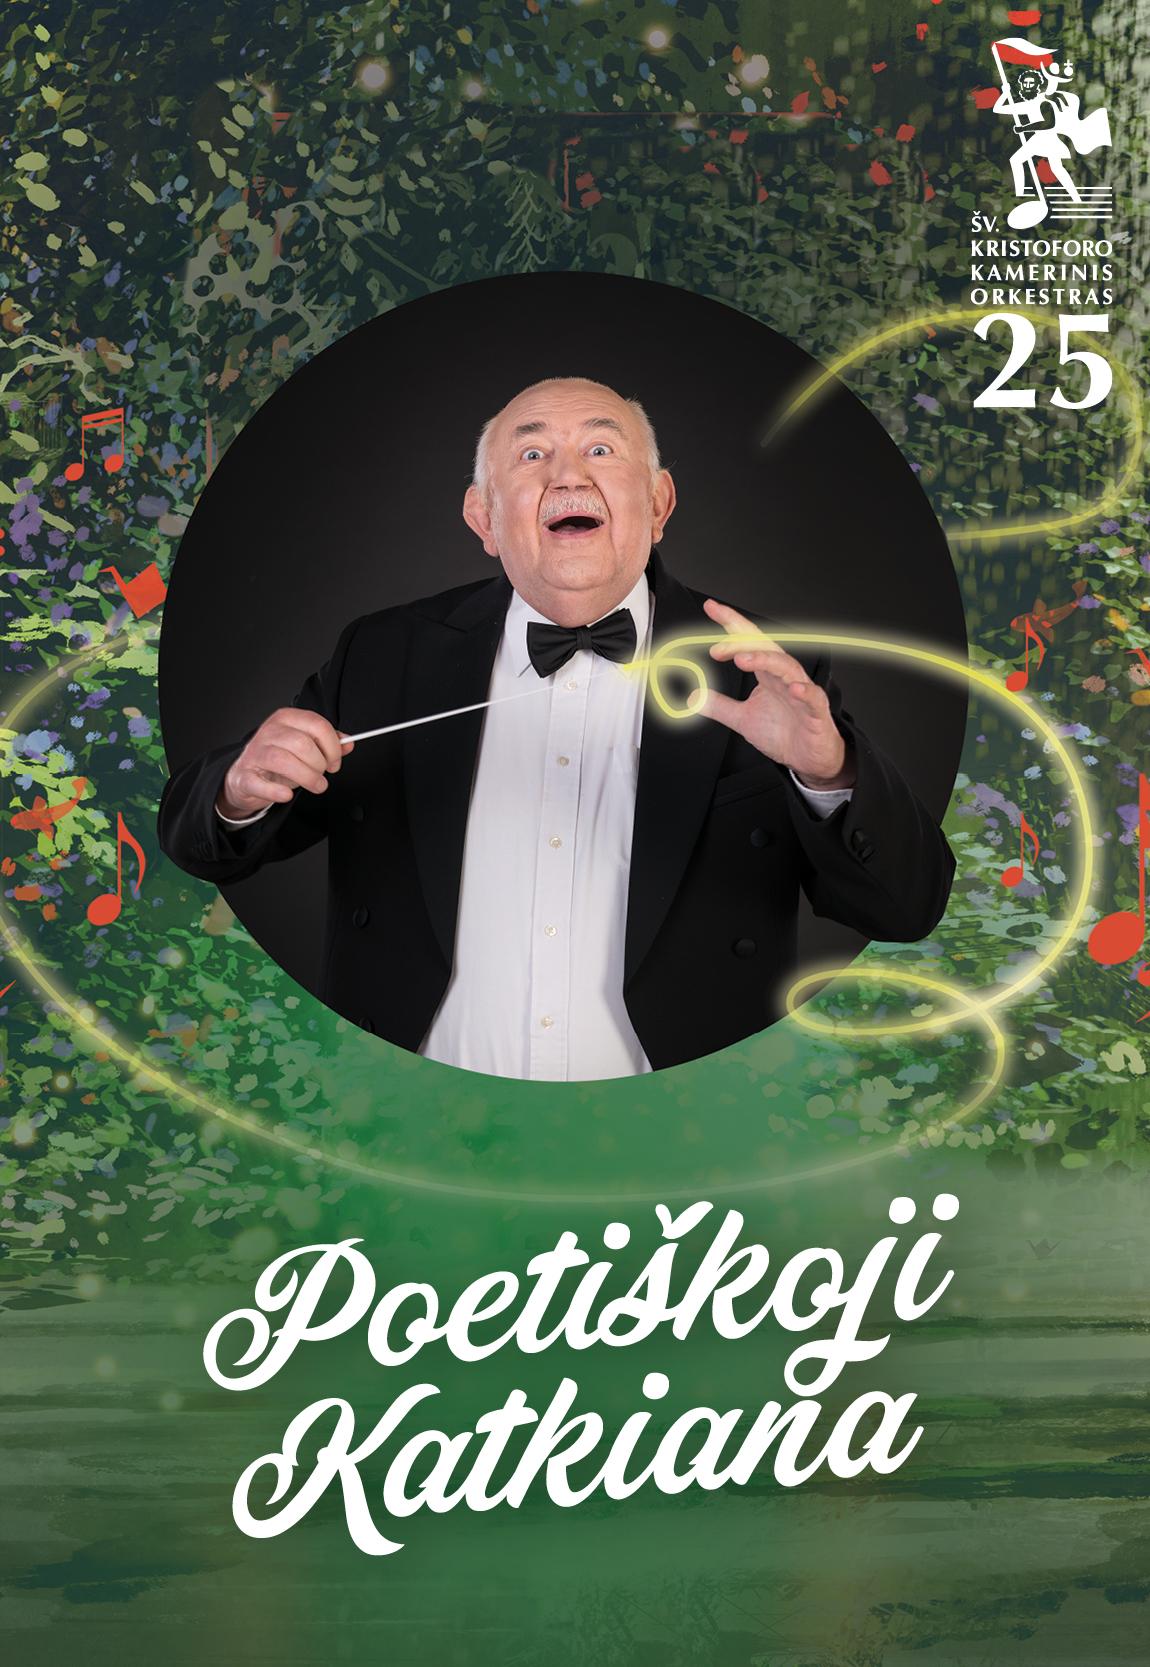 Poetic Katkiana